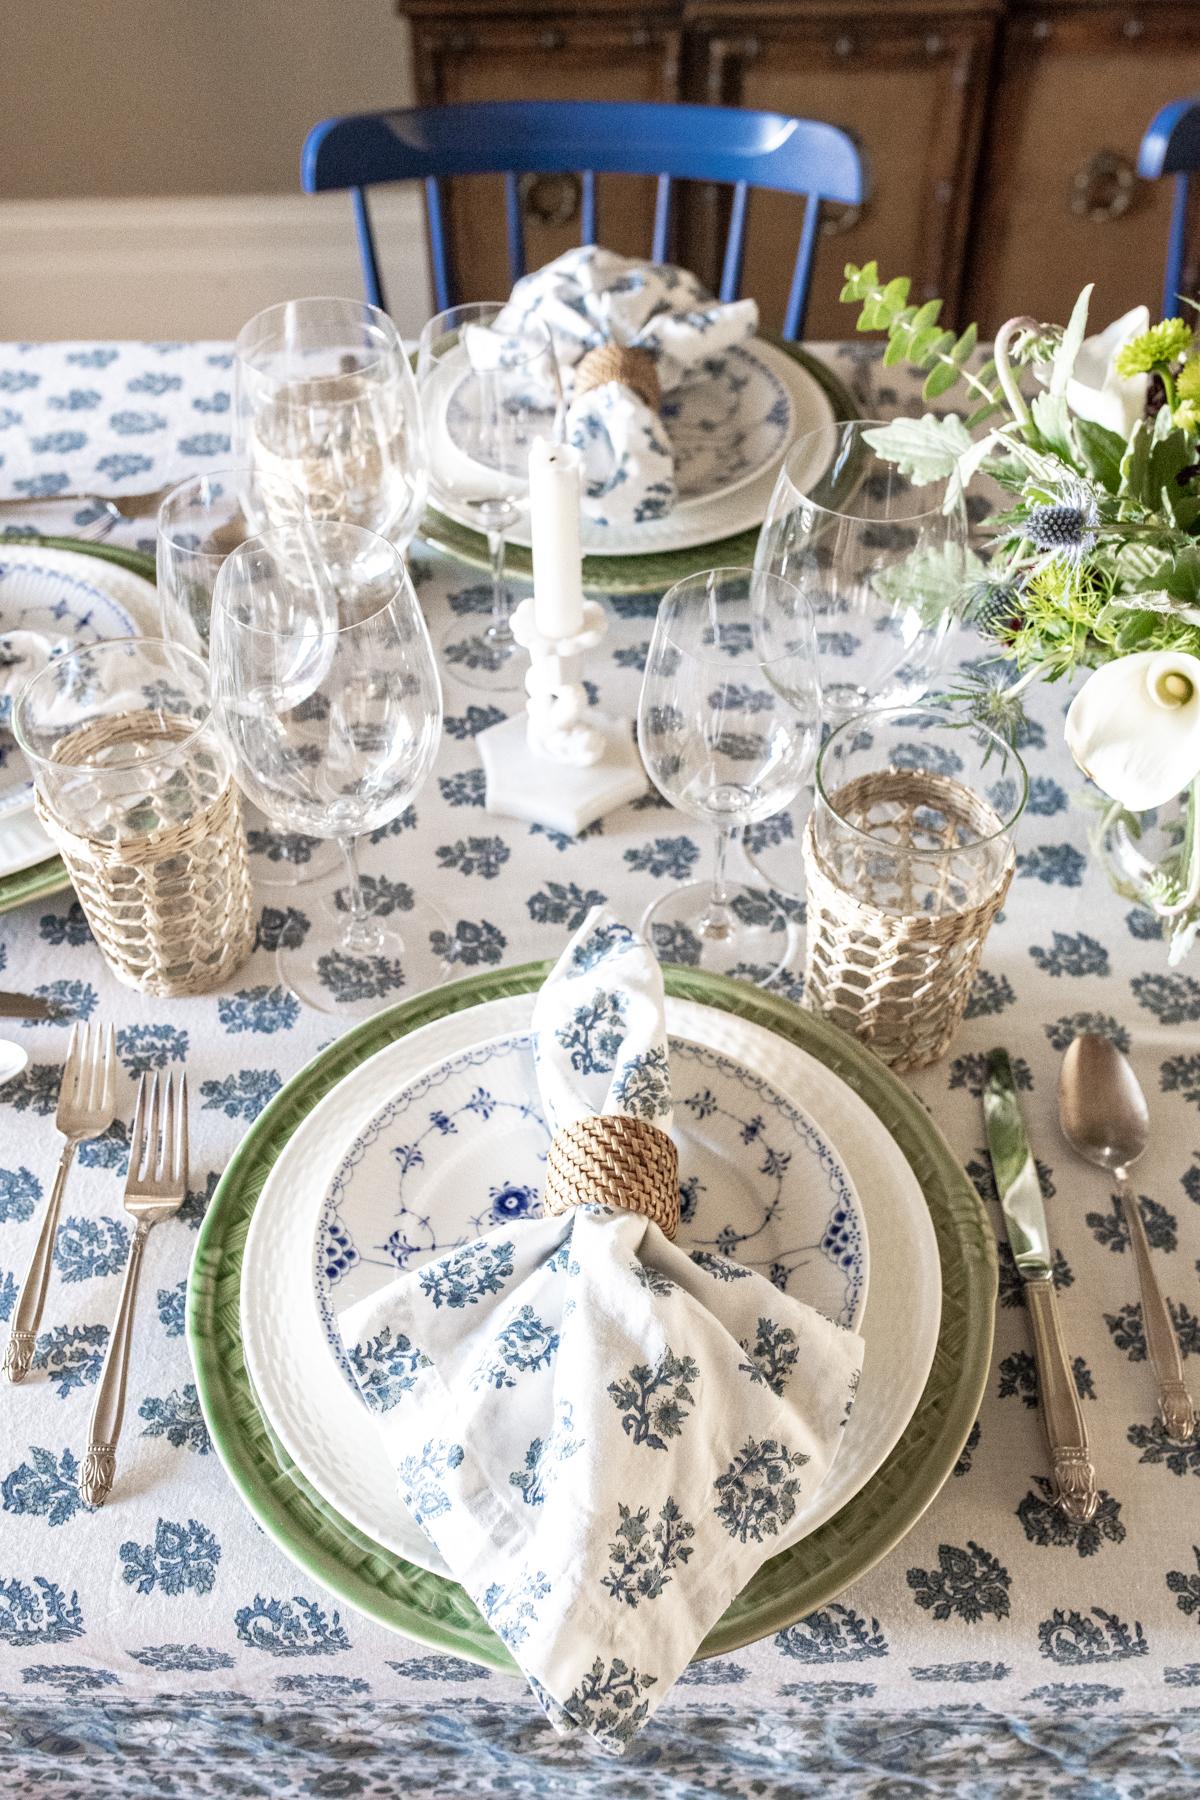 Spring Dinner Party Table x Pottery Barn  x Stacie Flinner-16.jpg